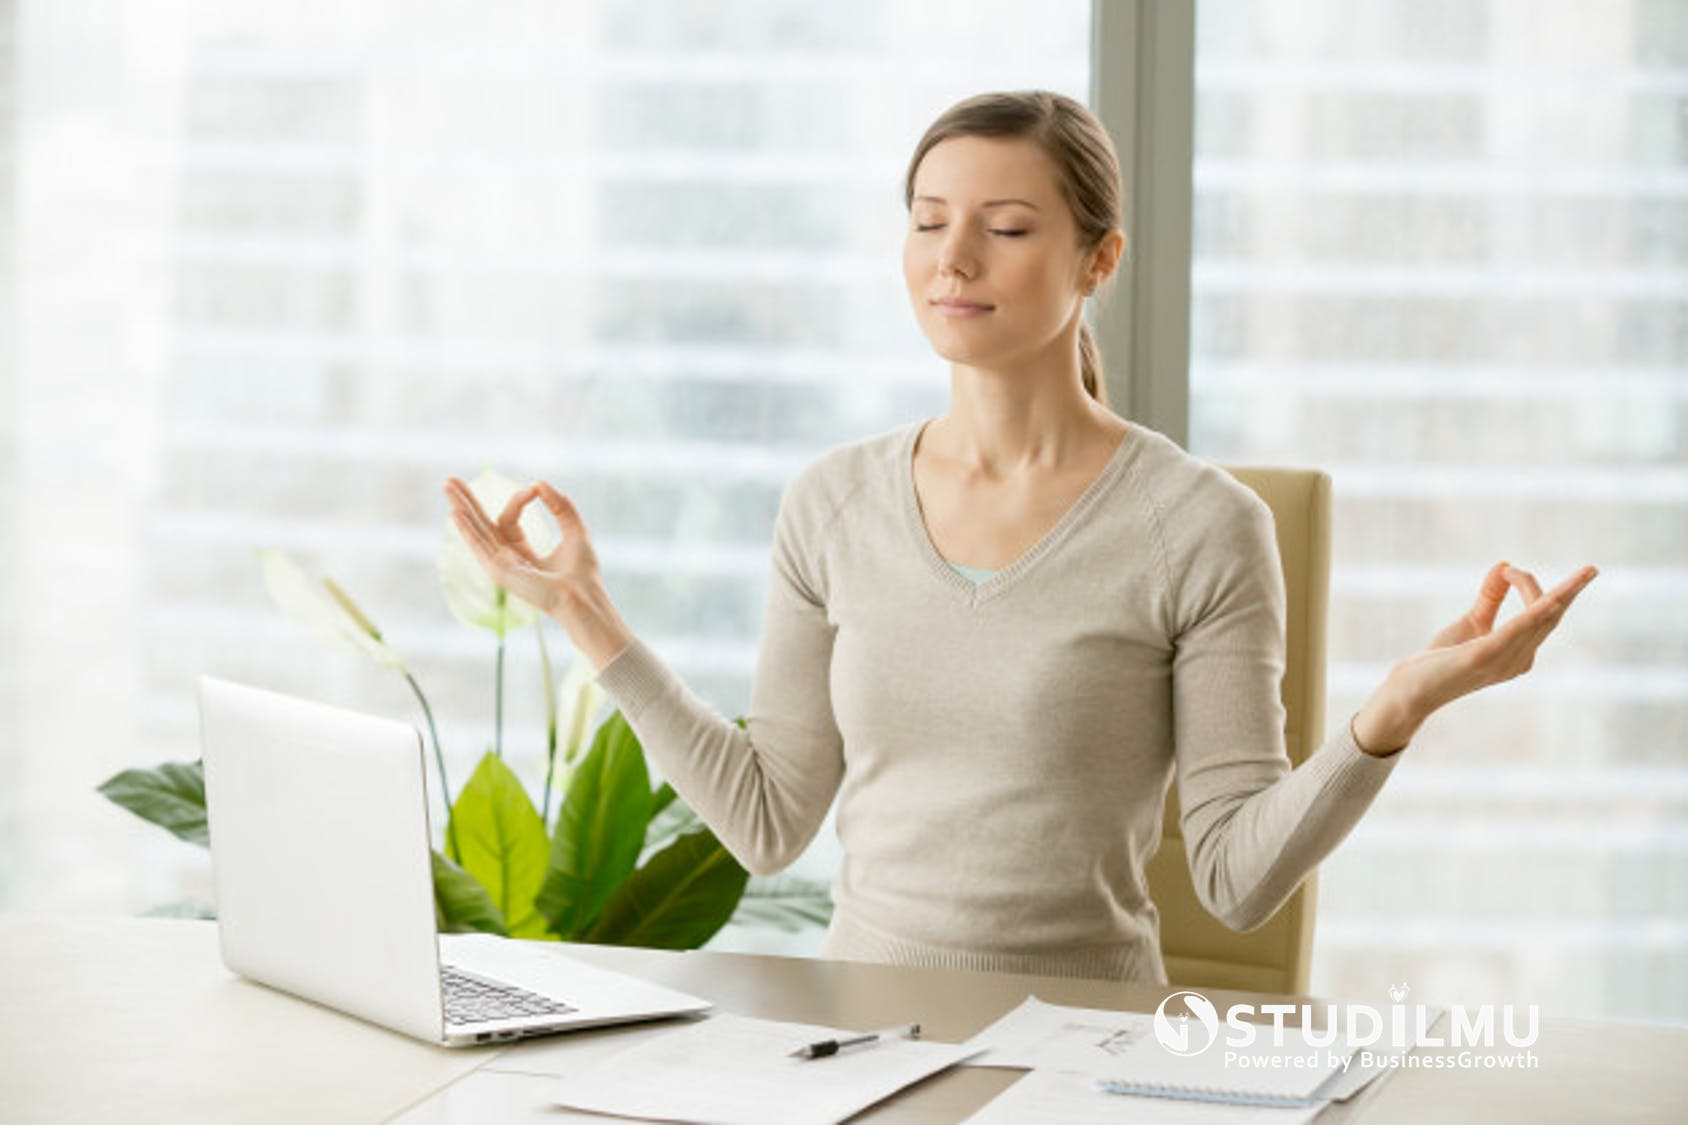 STUDILMU Career Advice - 4 Strategi Meraih Keseimbangan Hidup Bagi Pengusaha